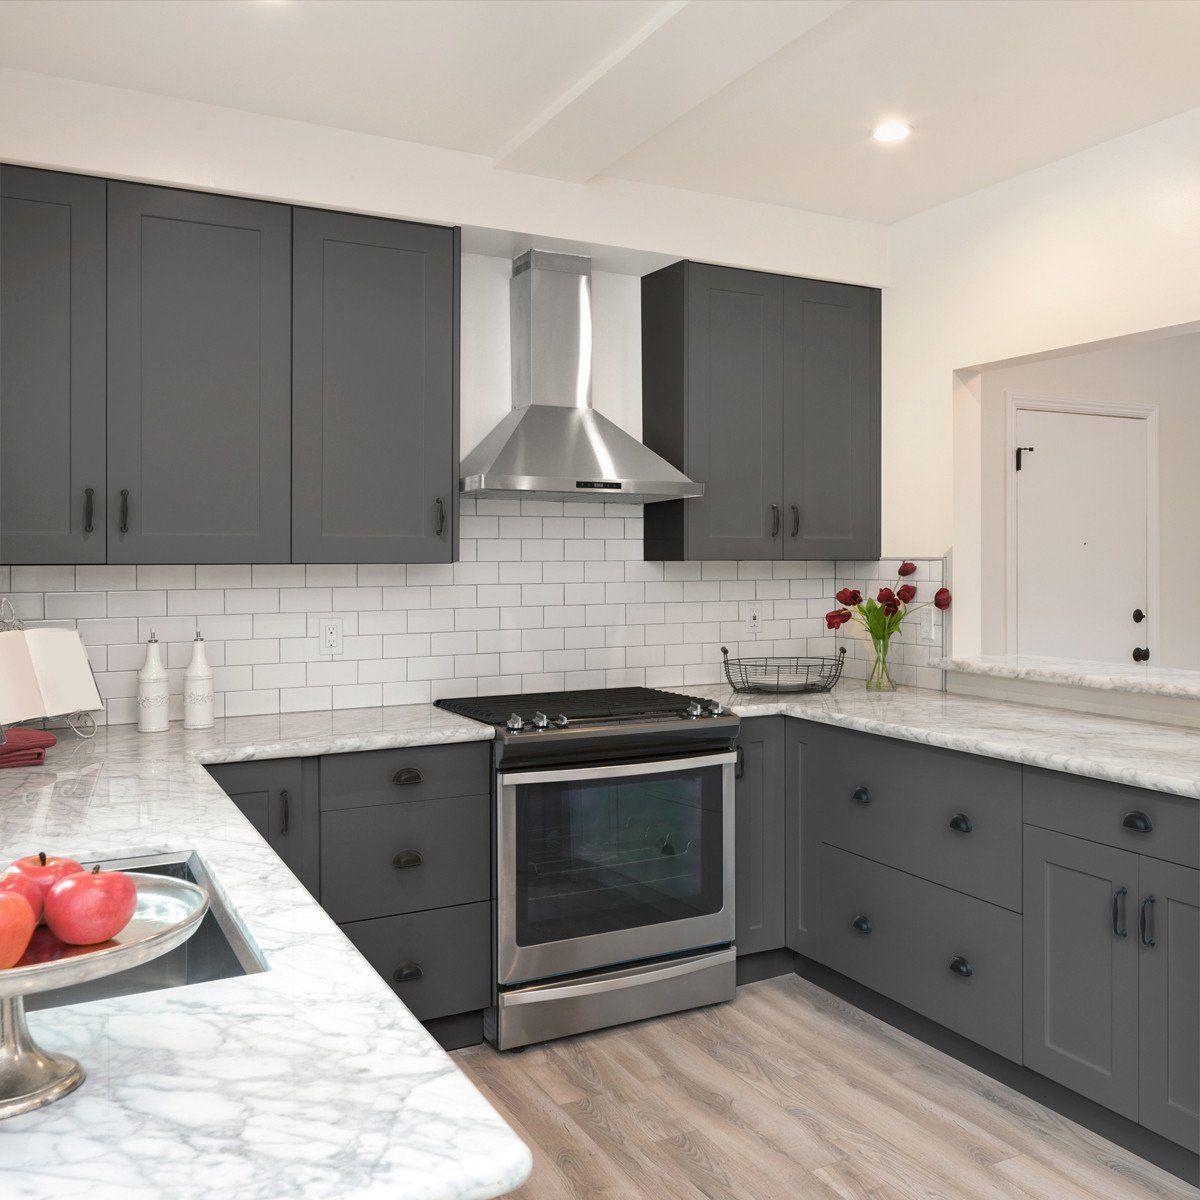 Nuvo Earl Grey Cabinet Paint Kit in 2019  Kitchen ideas